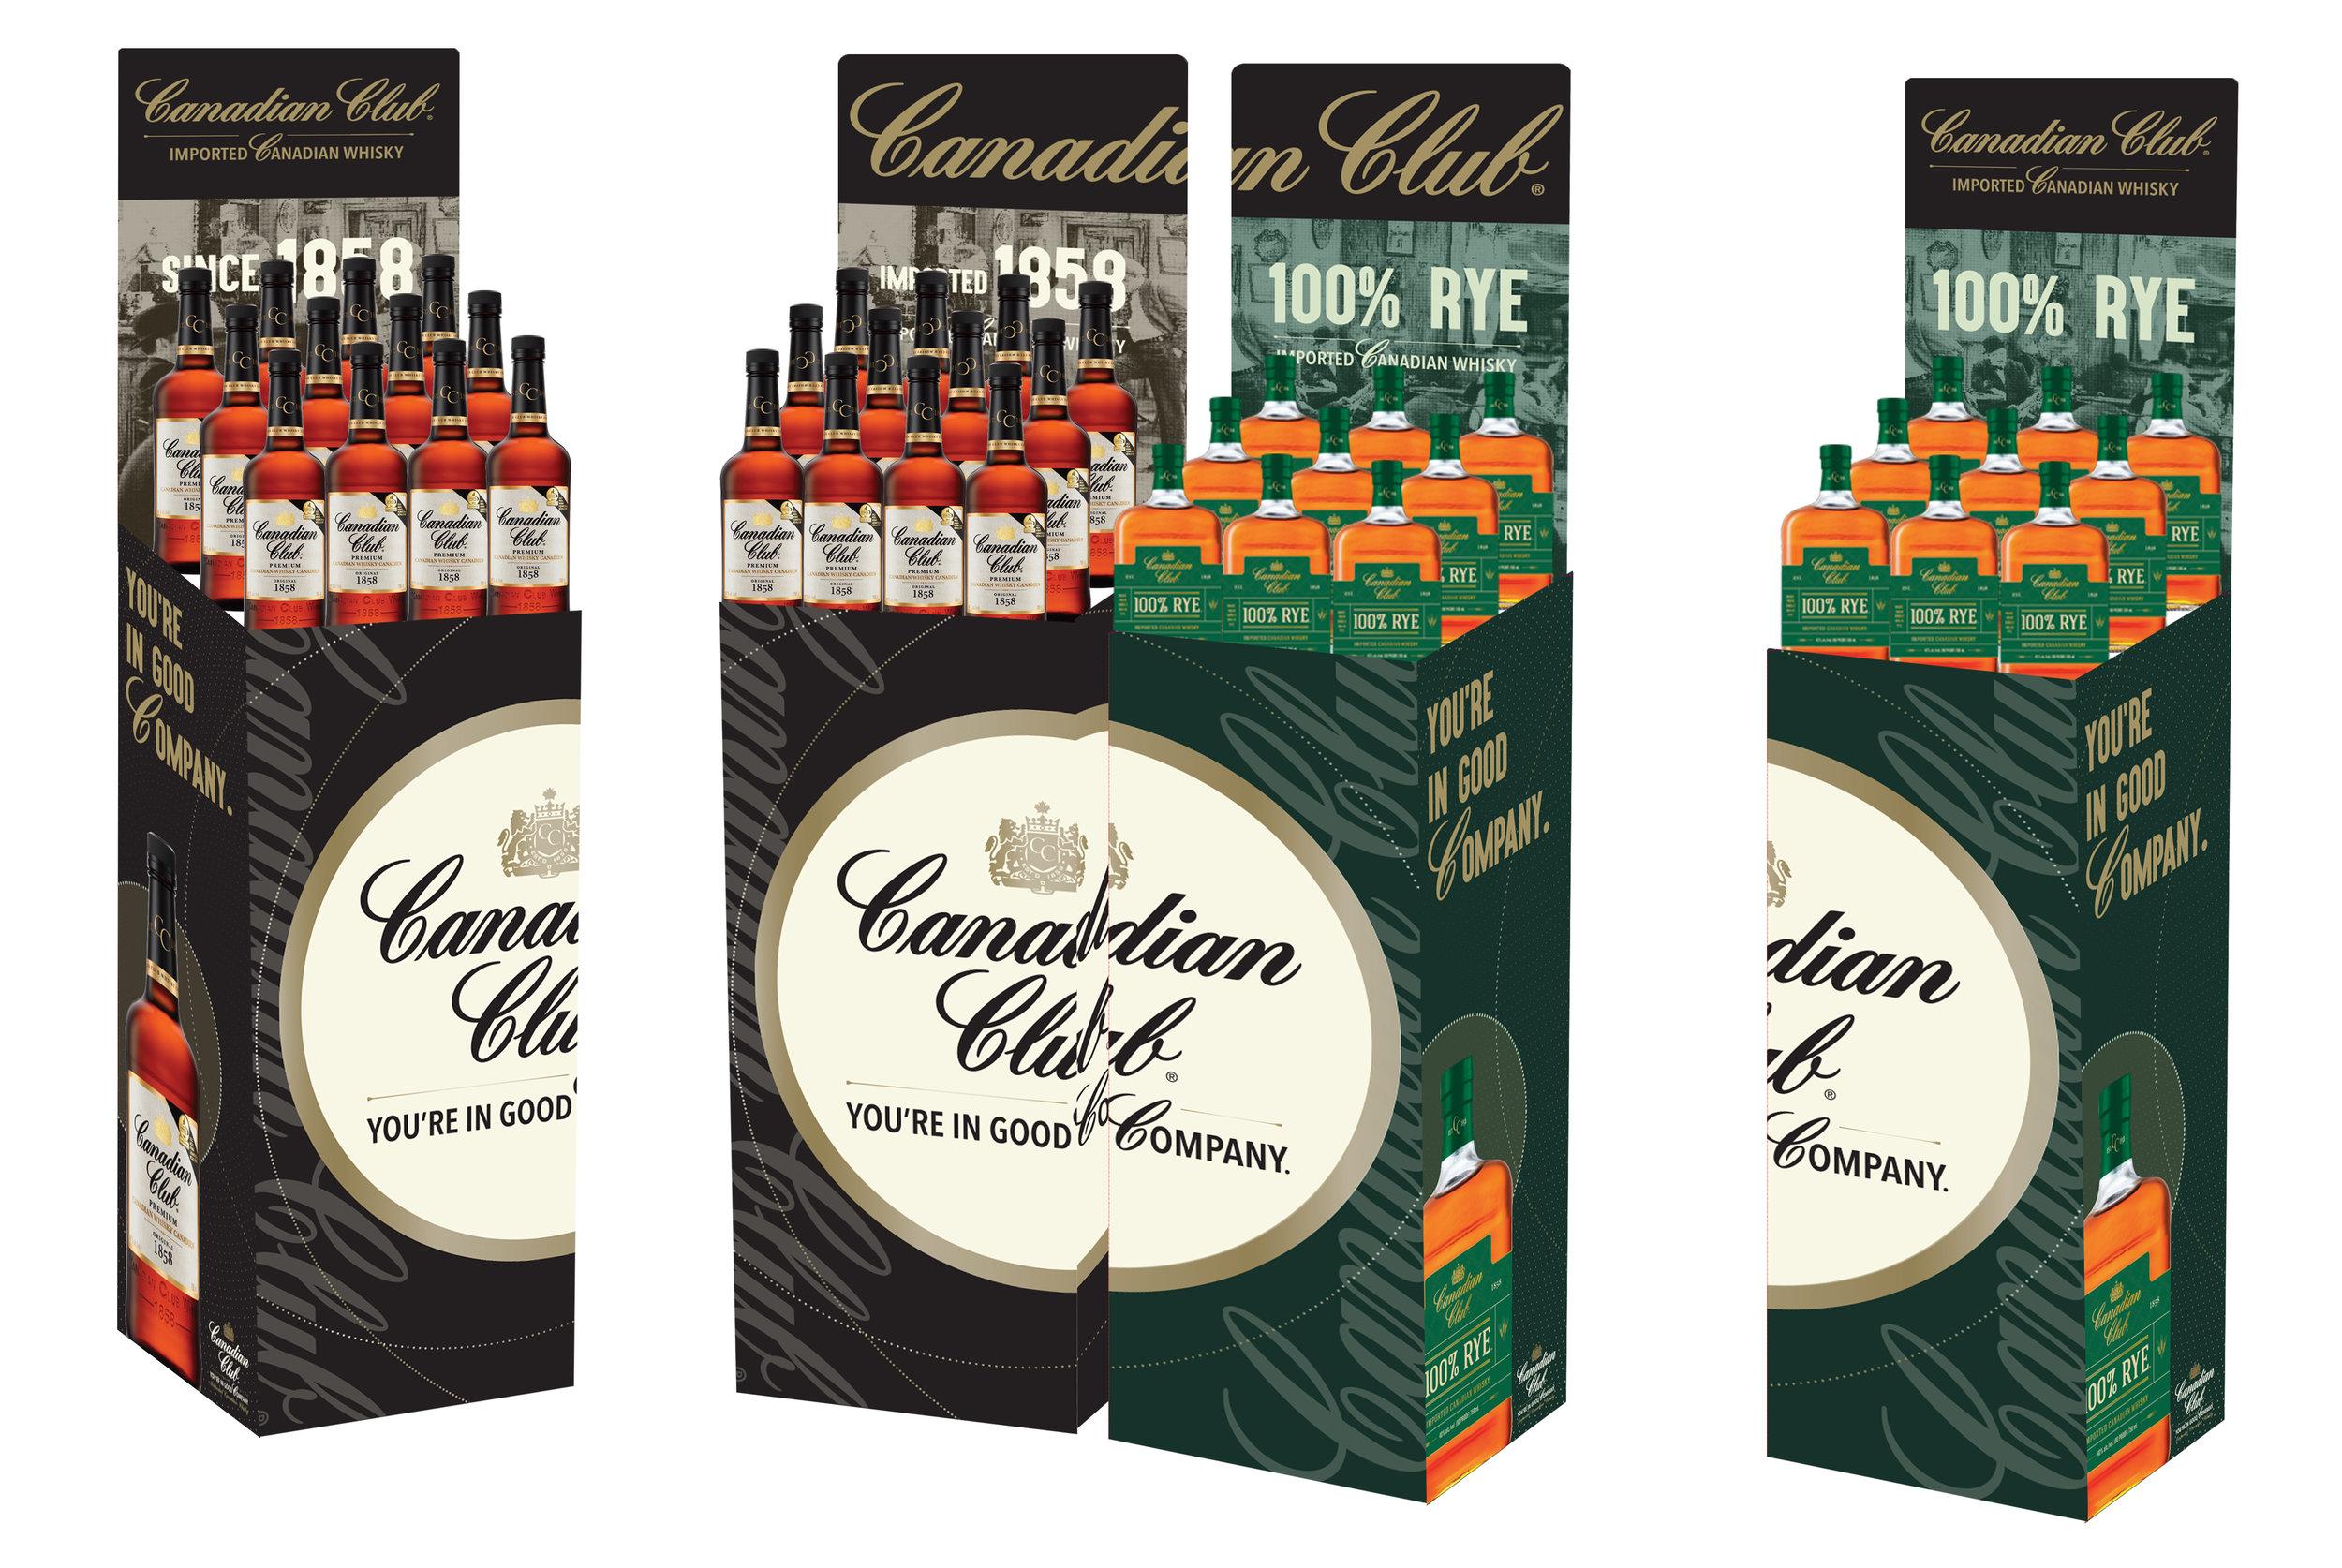 Canadian Club Activation - 3 Case Bins